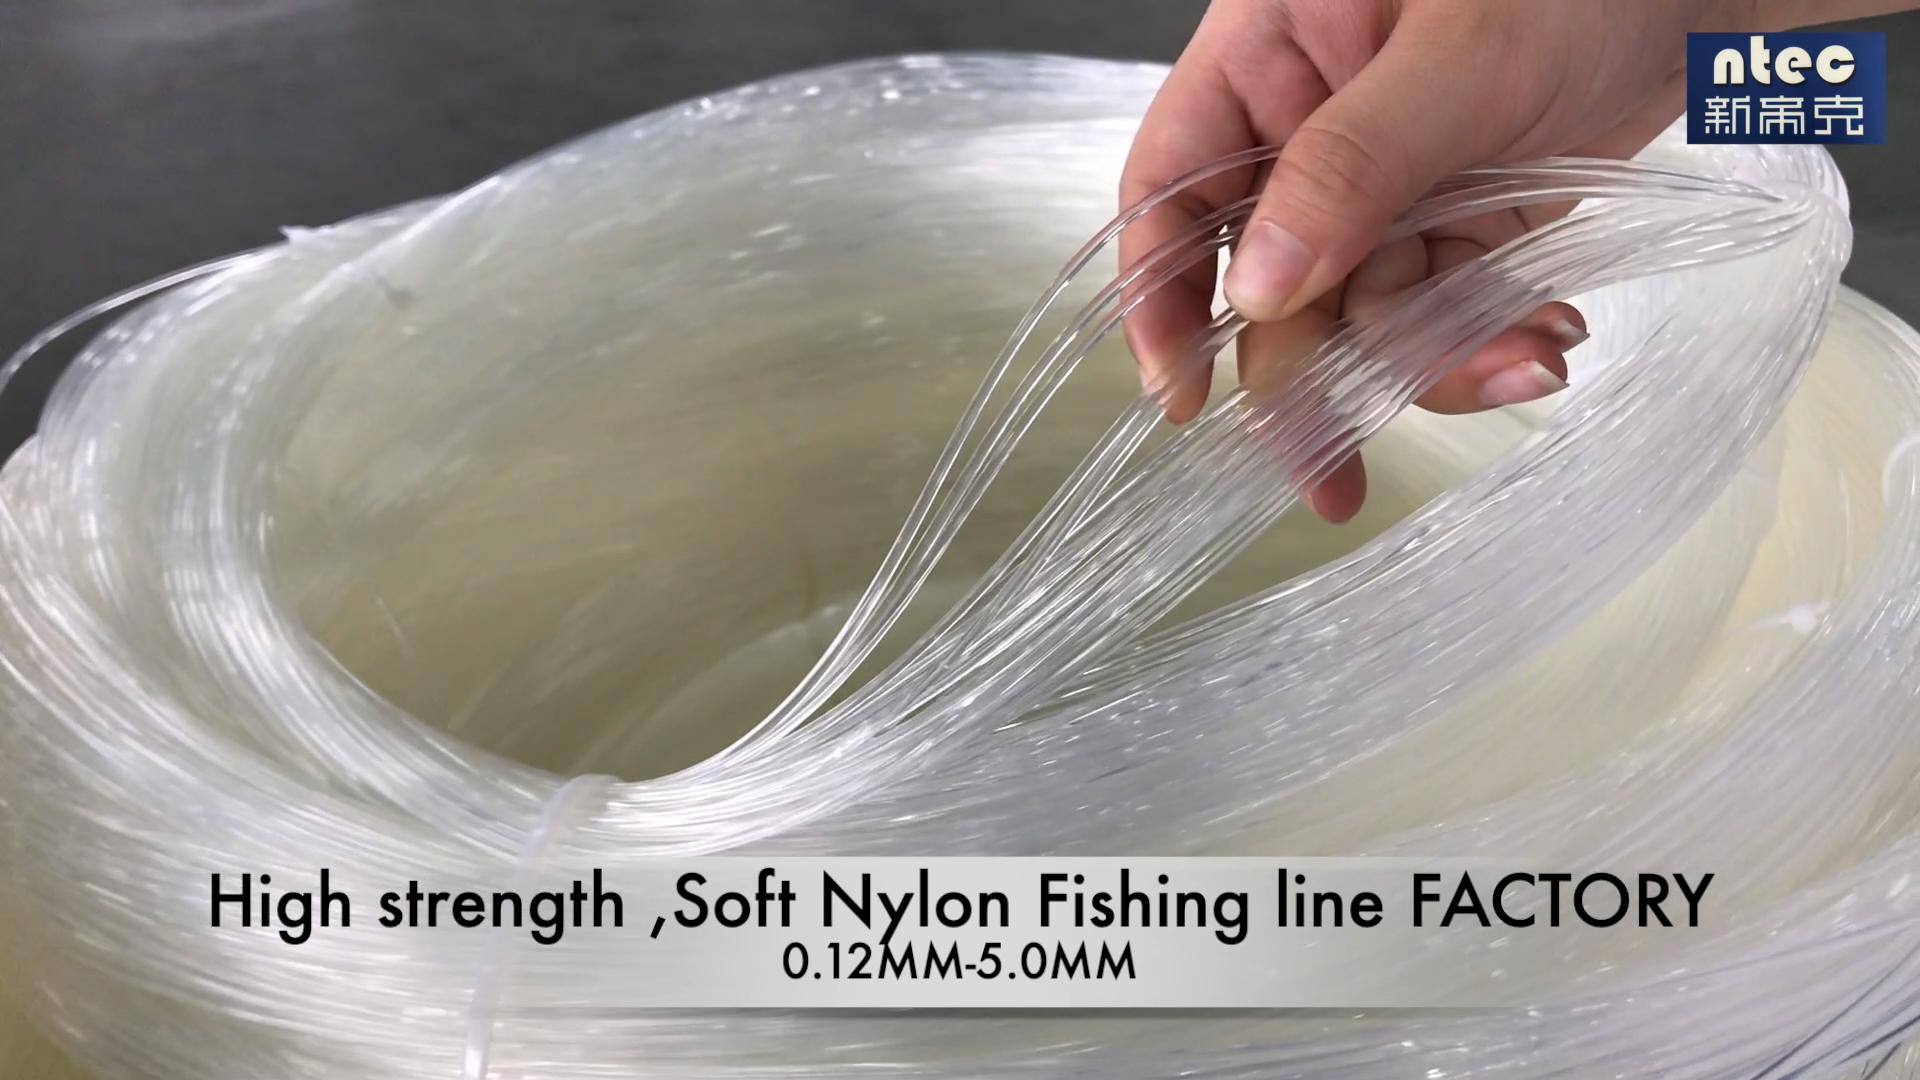 1.0MM 1.1MM 2.0MM 3.0MM बेहतर शक्ति लंबी लाइन मछली पकड़ने की रेखा